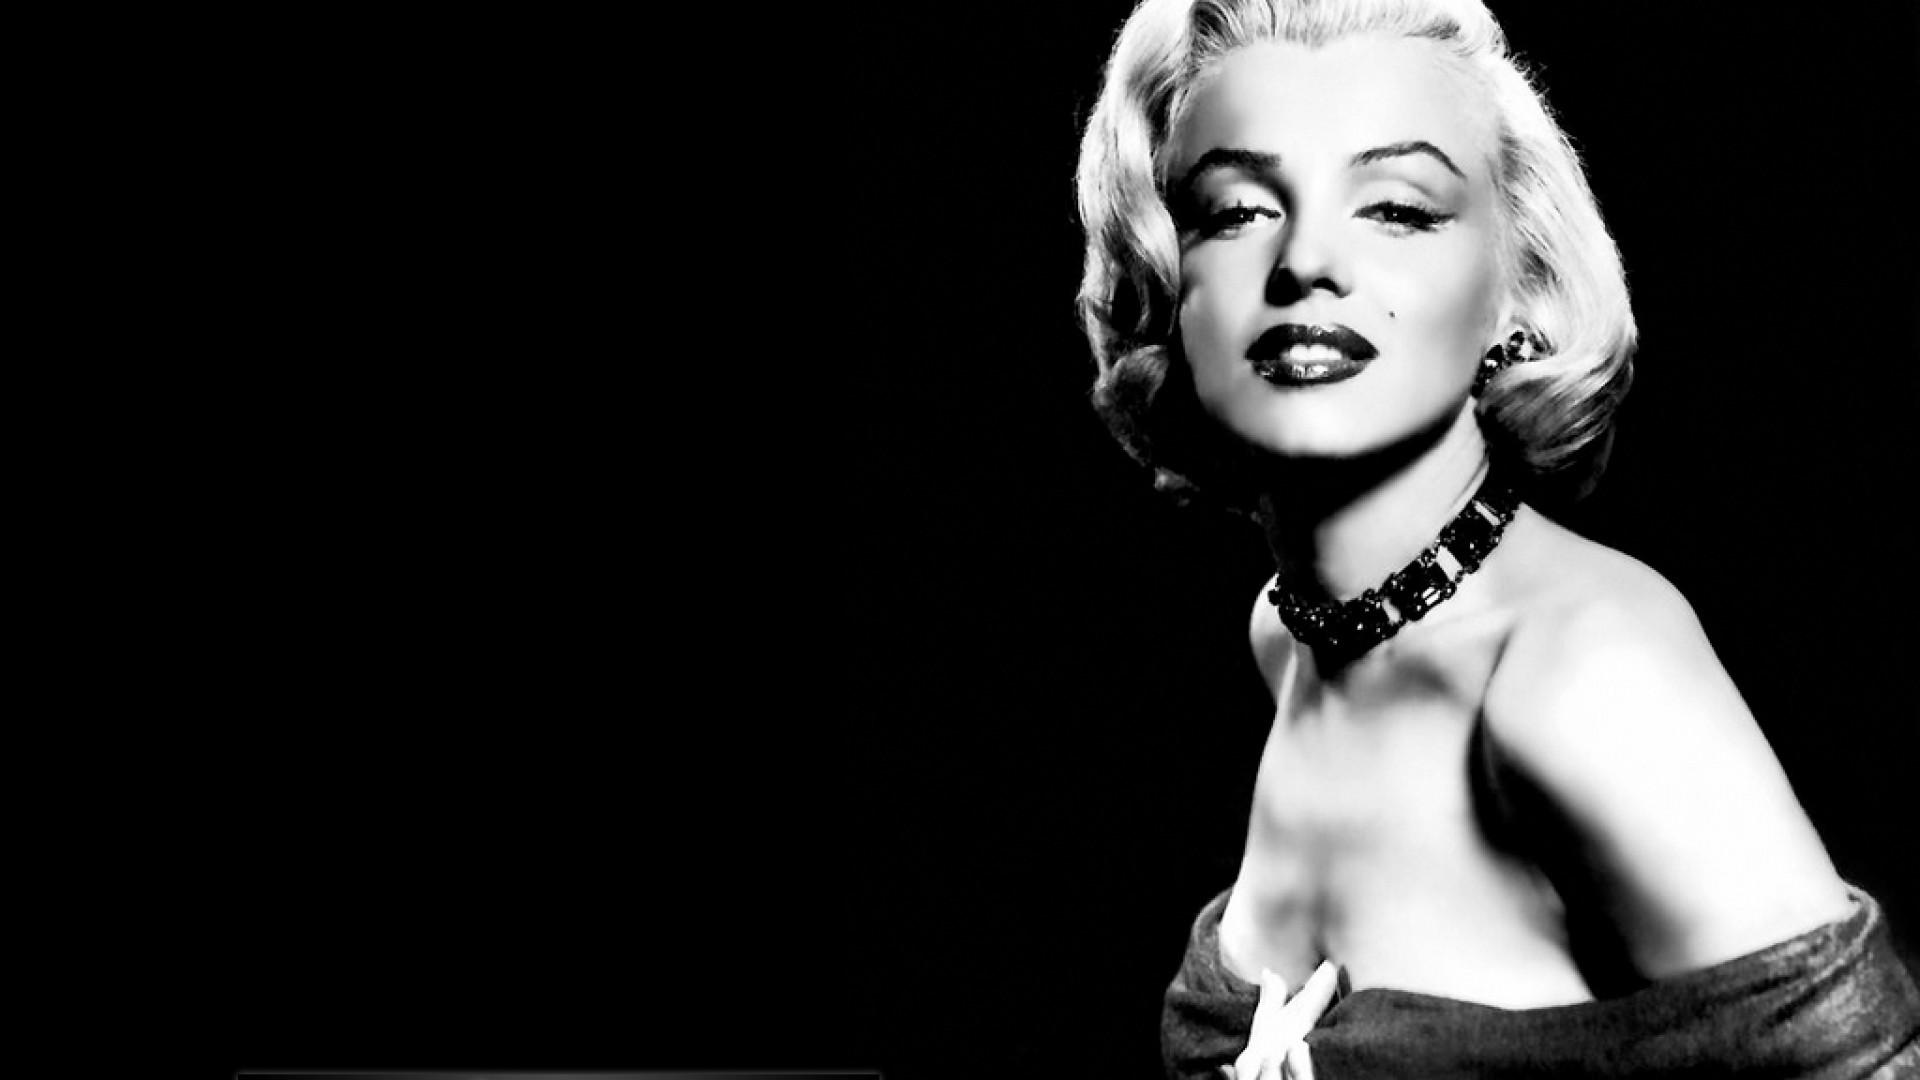 Marilyn monroe backgrounds wallpapersafari - Marilyn monroe wallpaper download ...